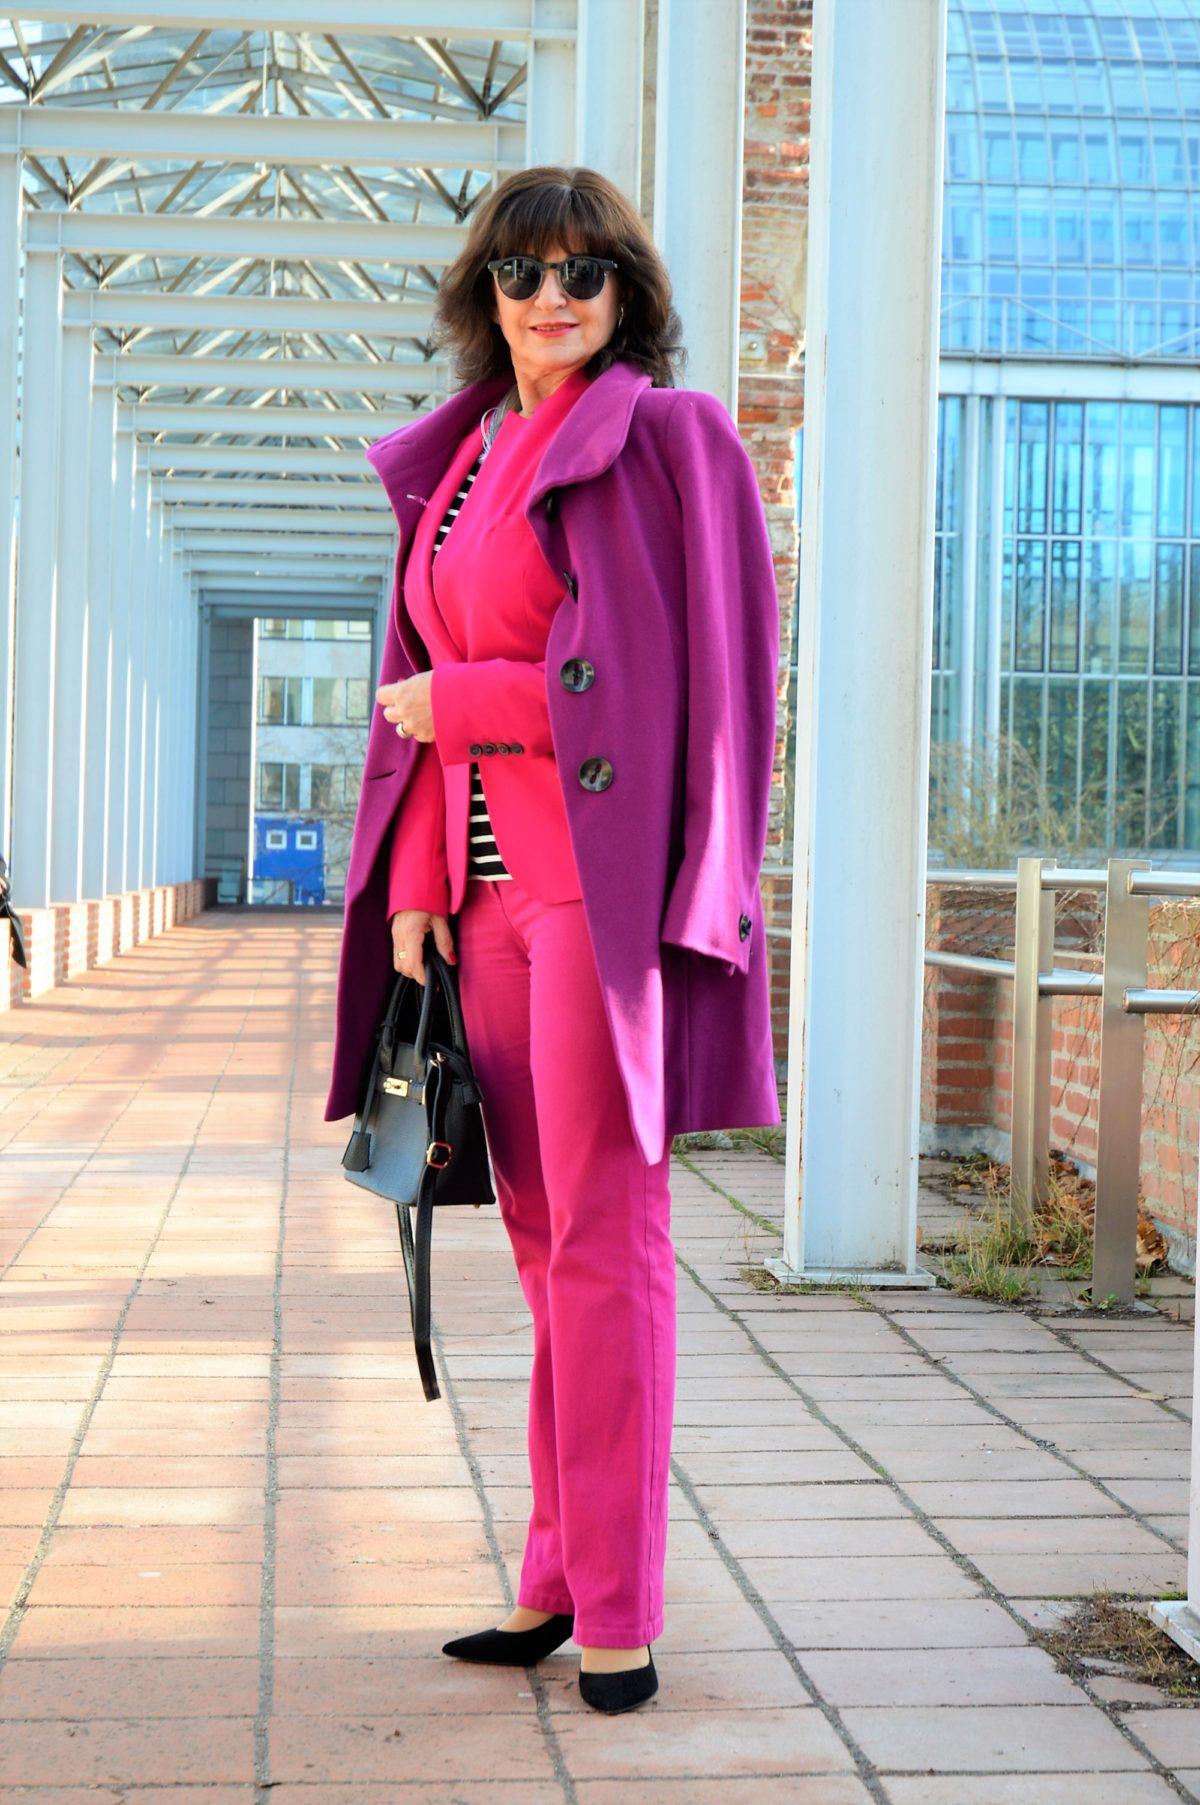 Mantel in Violett im Frühling